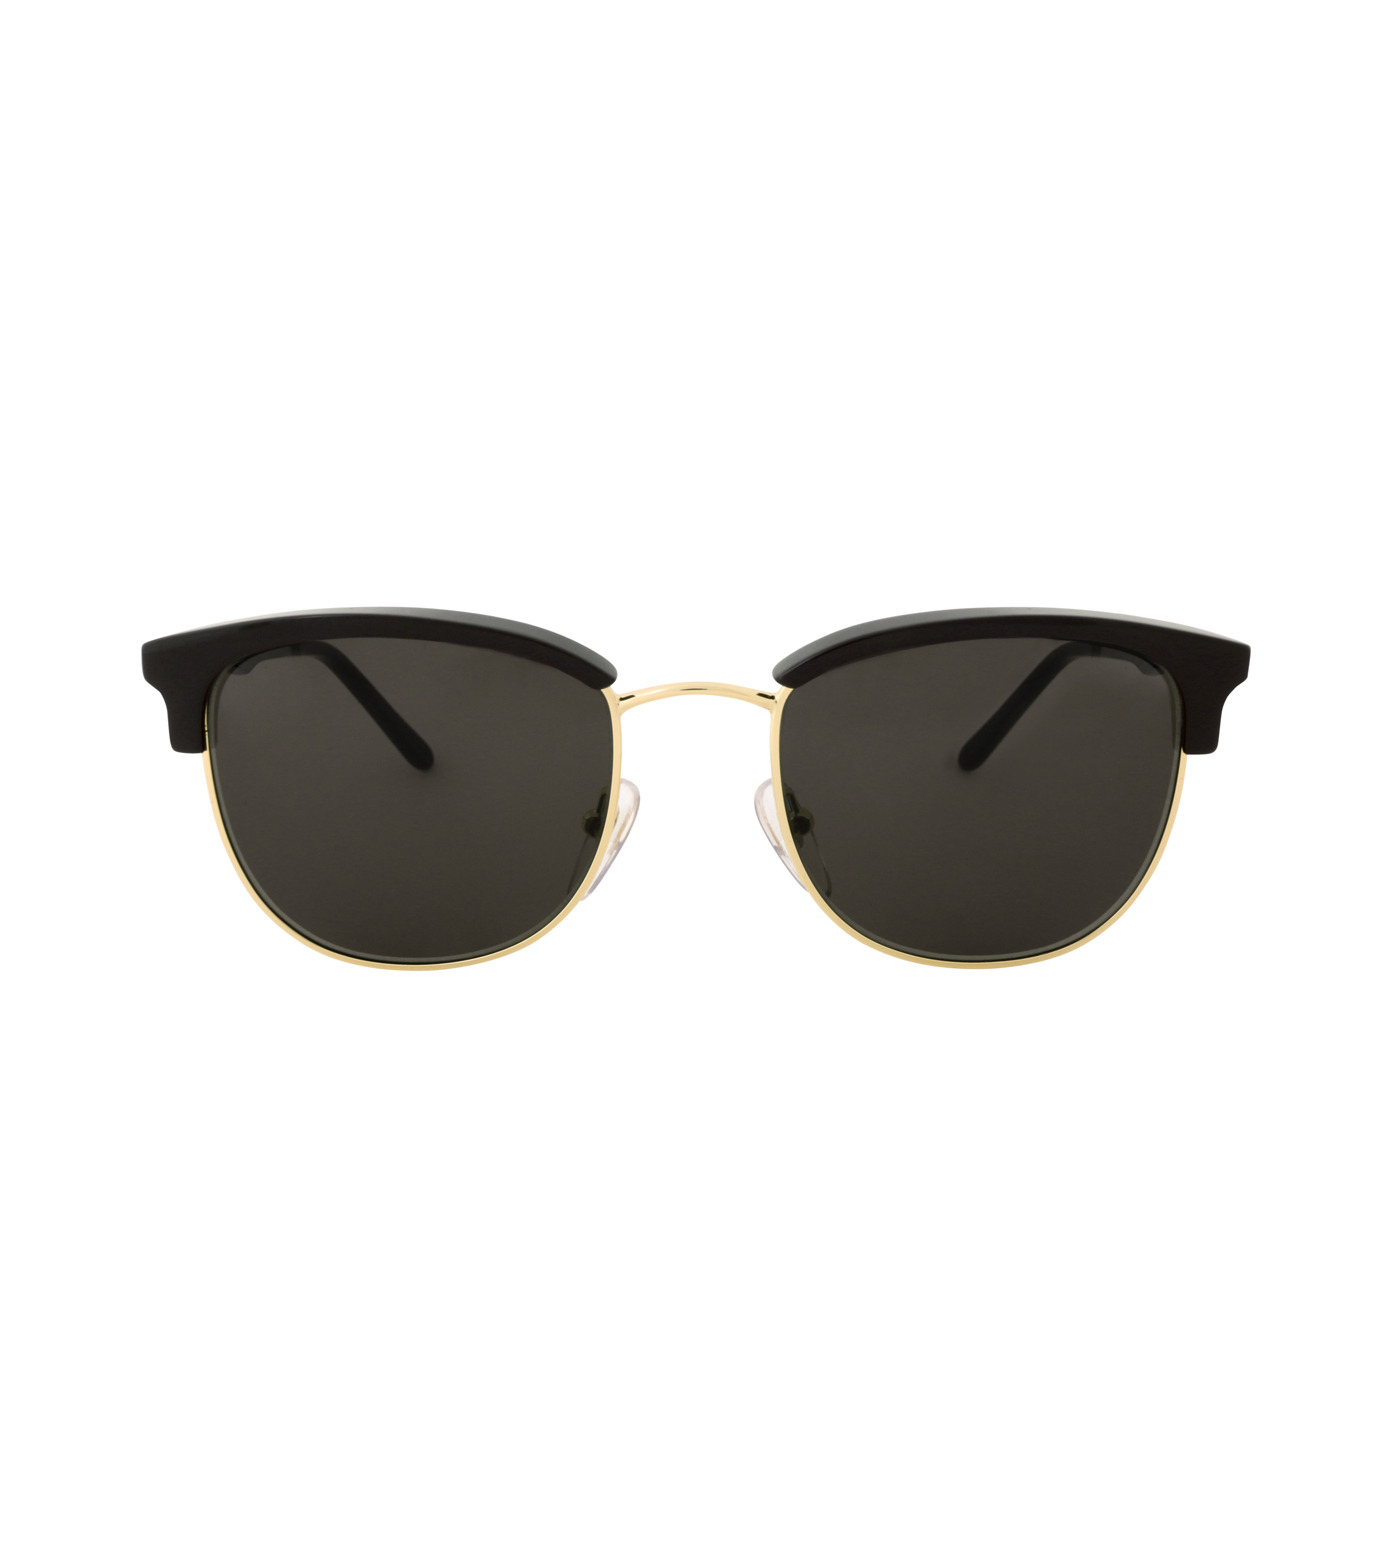 SUPER(スーパー)のTERAZZO BLACK-BLACK(アイウェア/eyewear)-SPRXXXX050-13 拡大詳細画像3